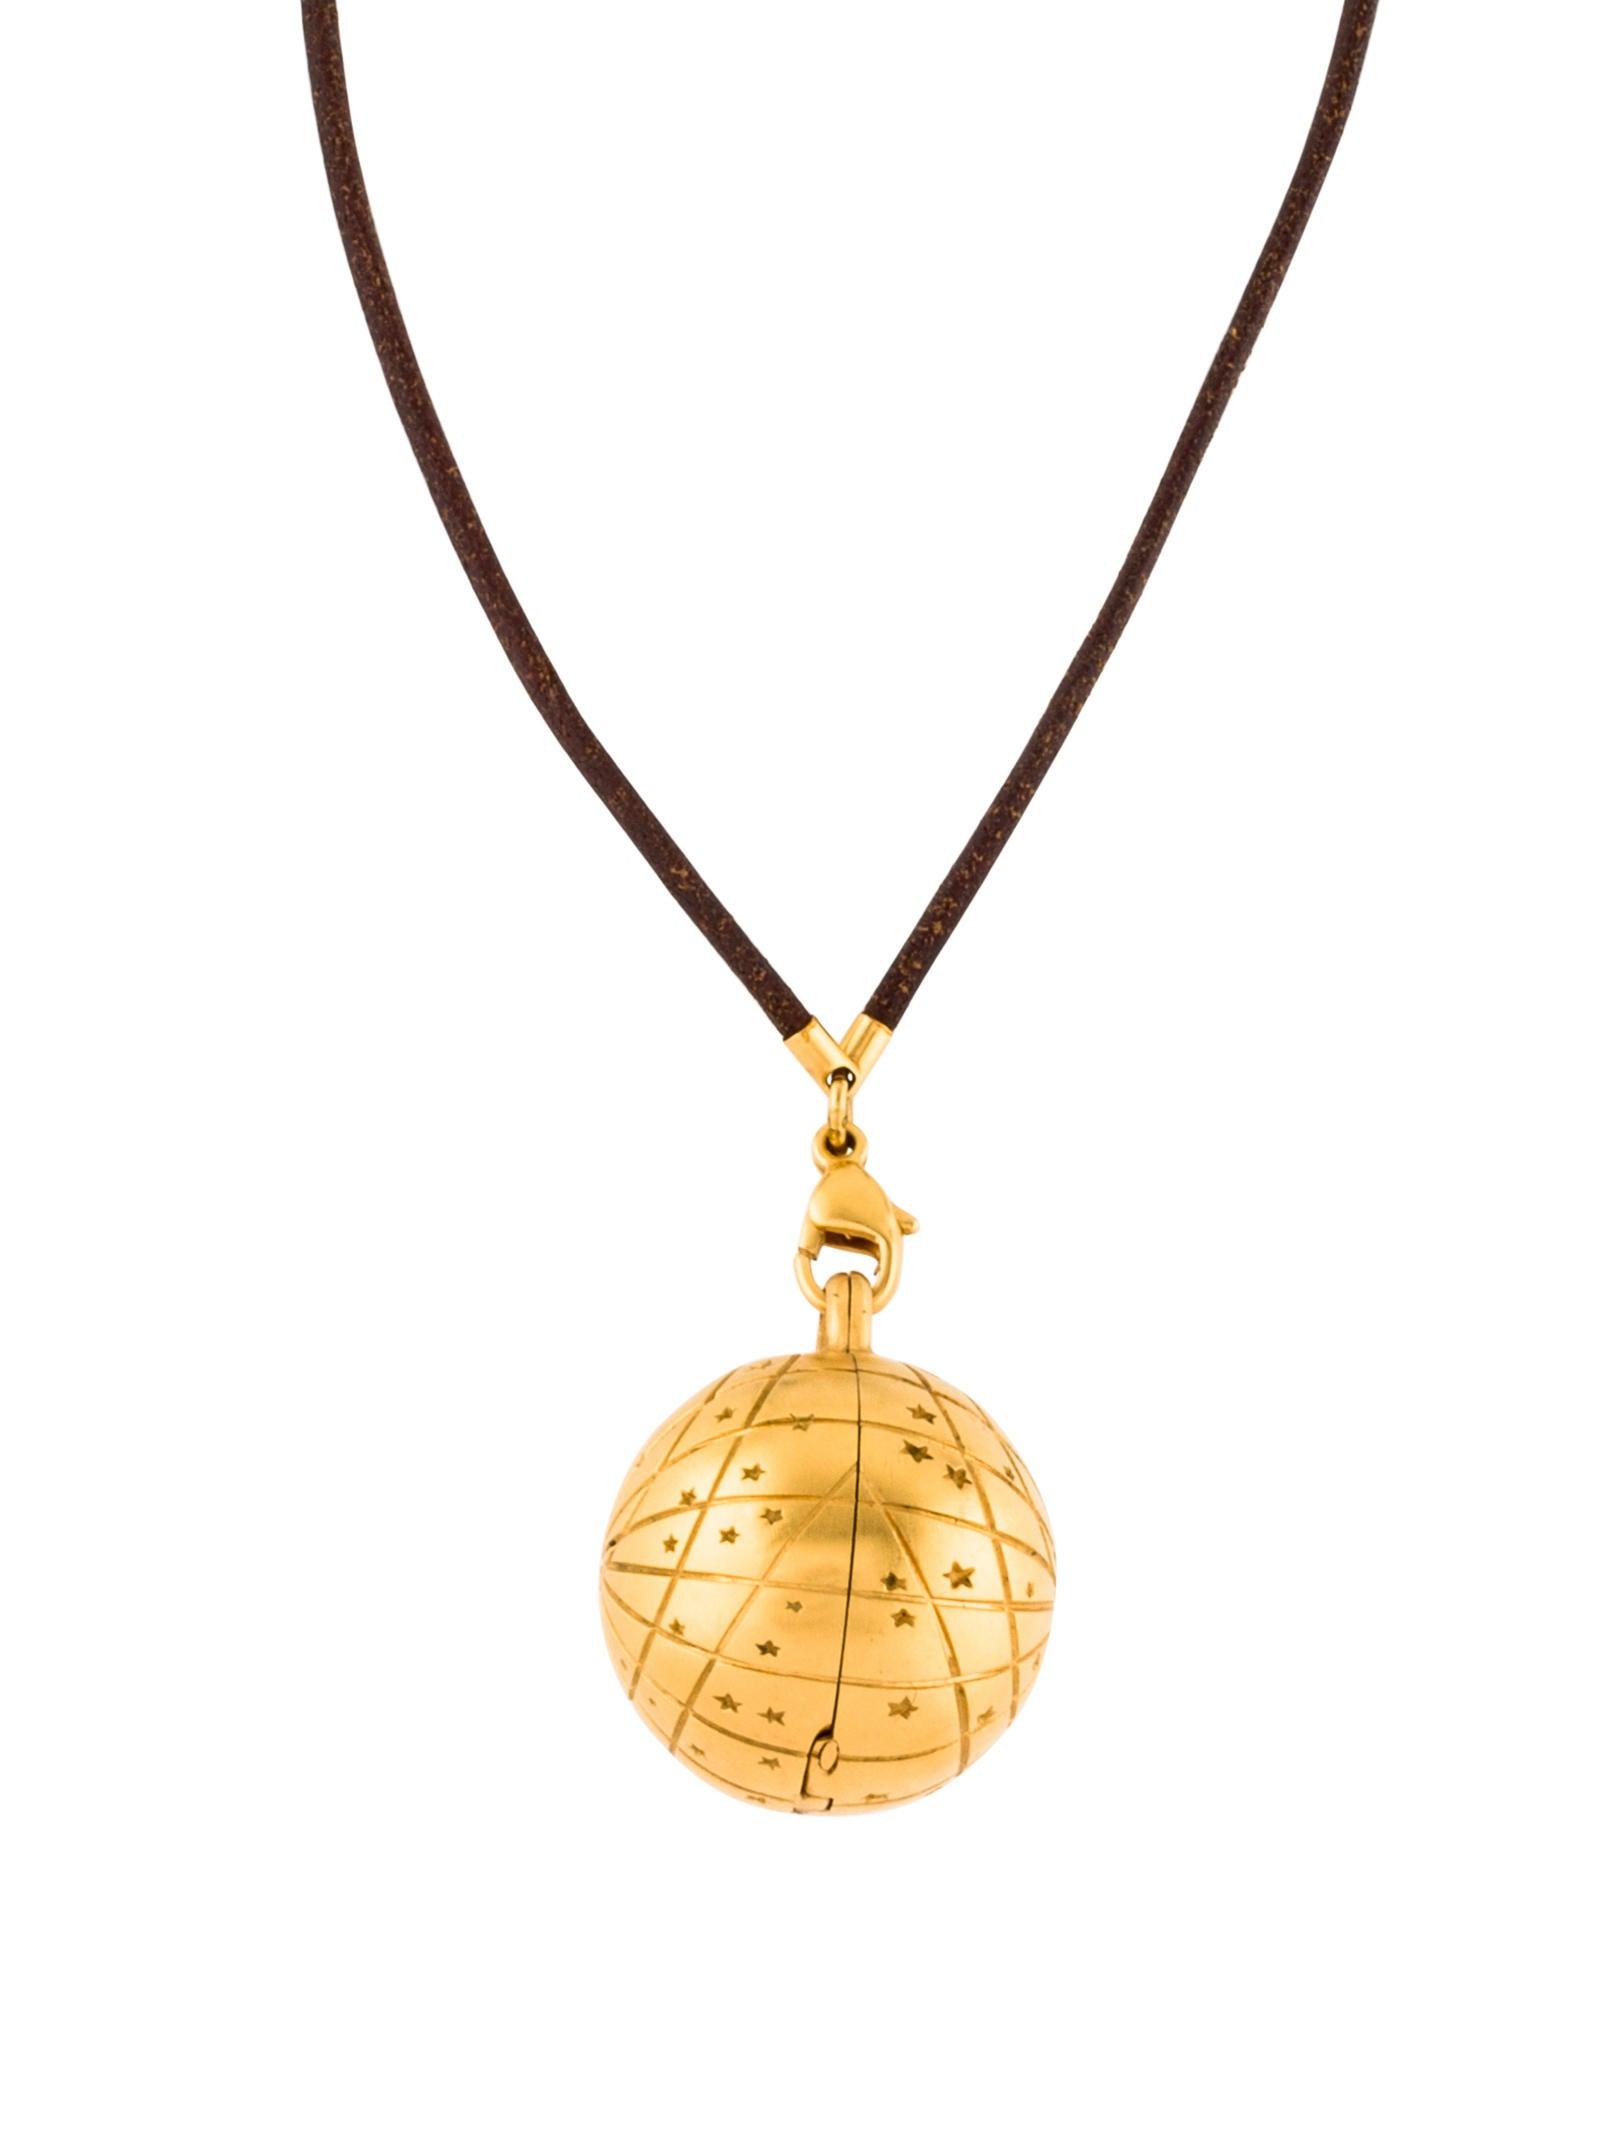 Herms zodiac globe pendant necklace necklaces her121556 the zodiac globe pendant necklace aloadofball Choice Image